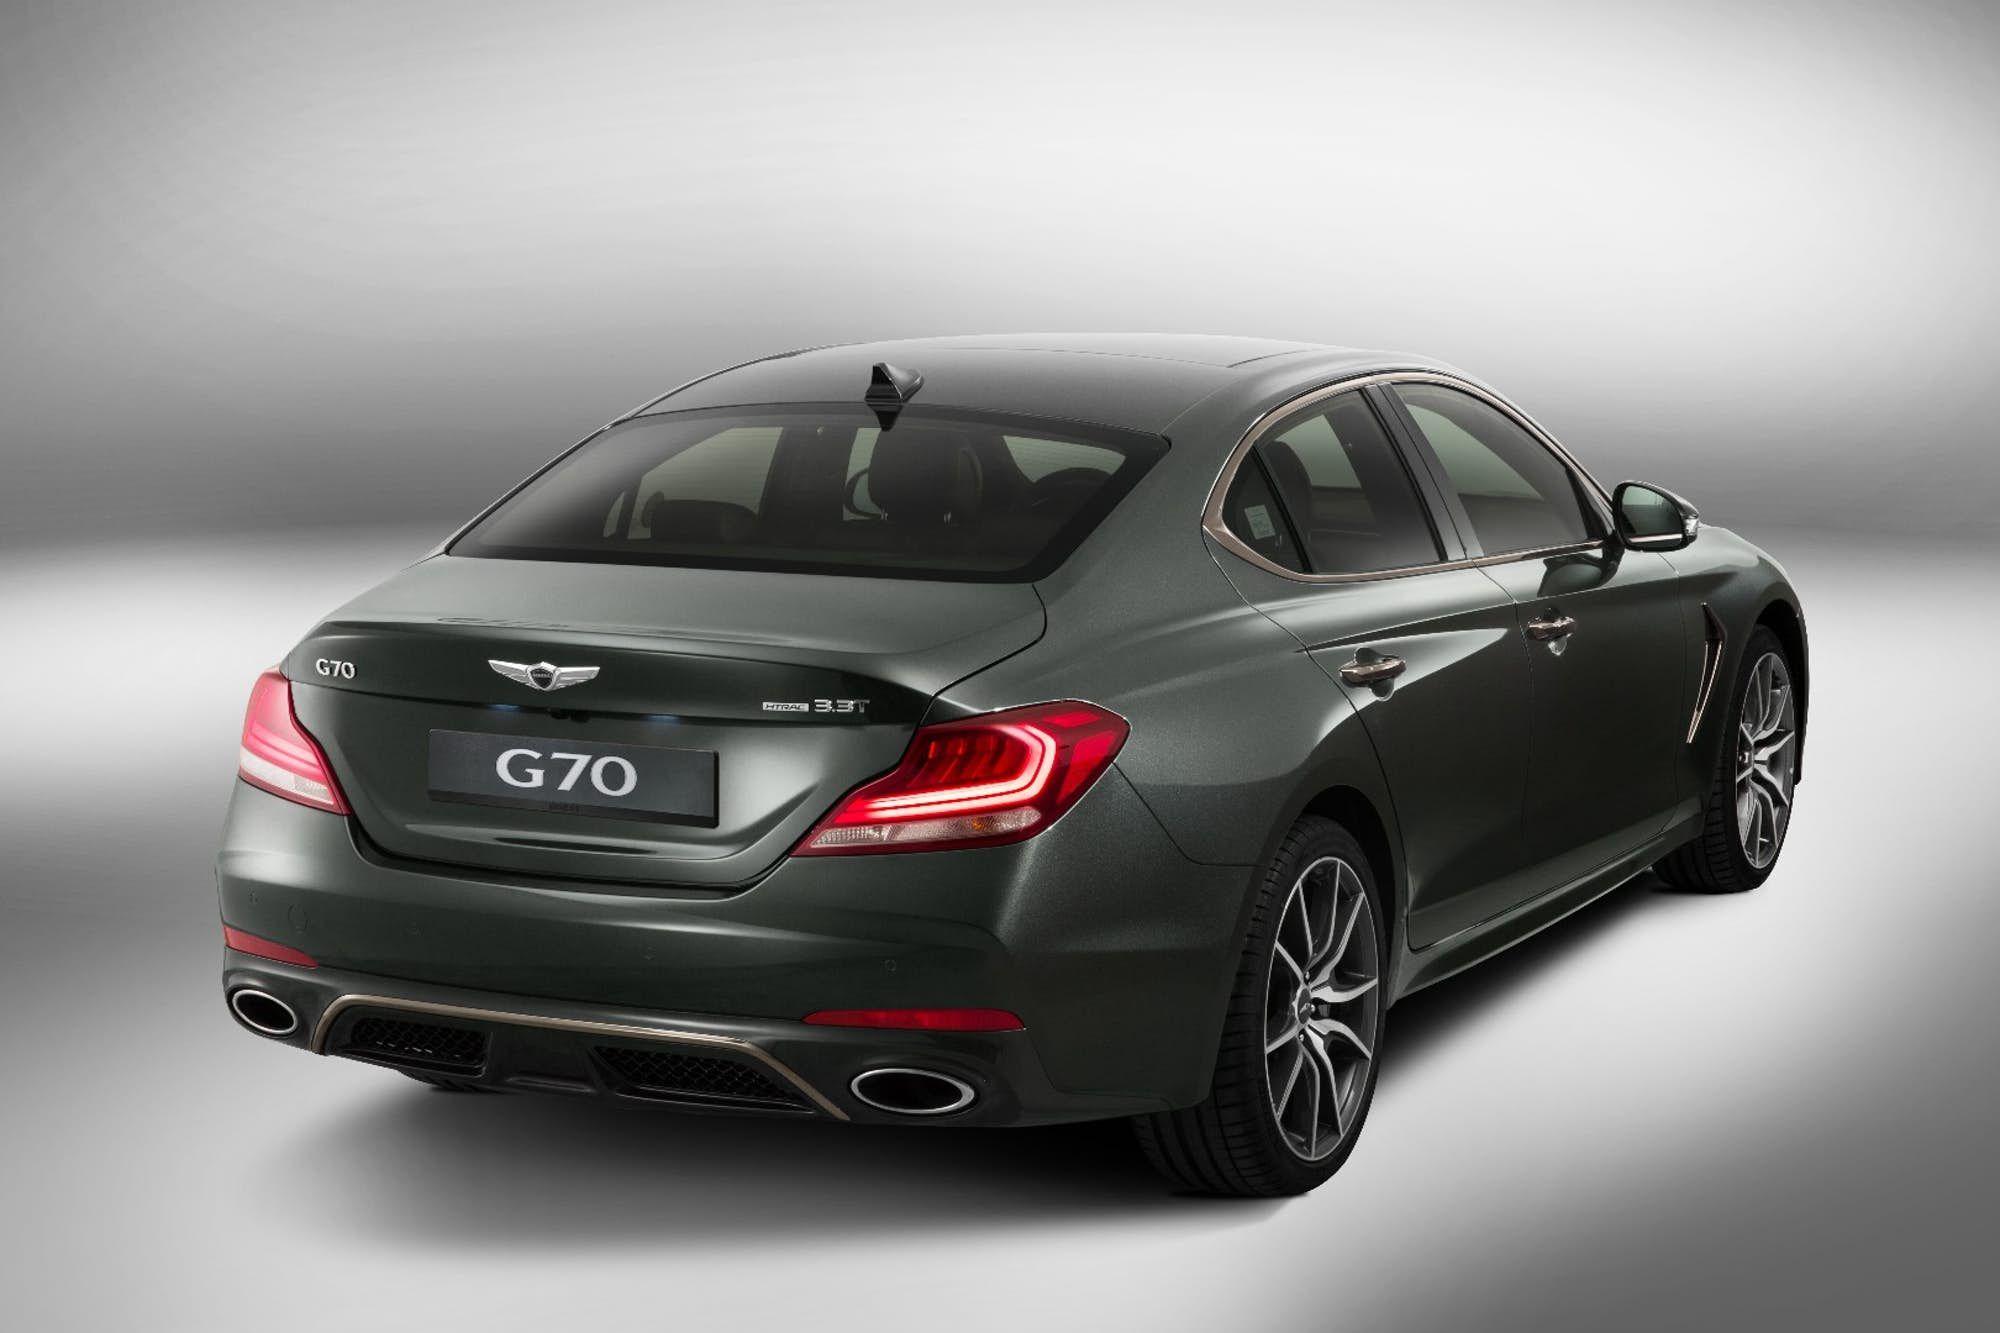 Hyundai Puts Luxury Spin On The Stinger With Genesis G70 Hyundai Genesis Lexus Ls Hyundai